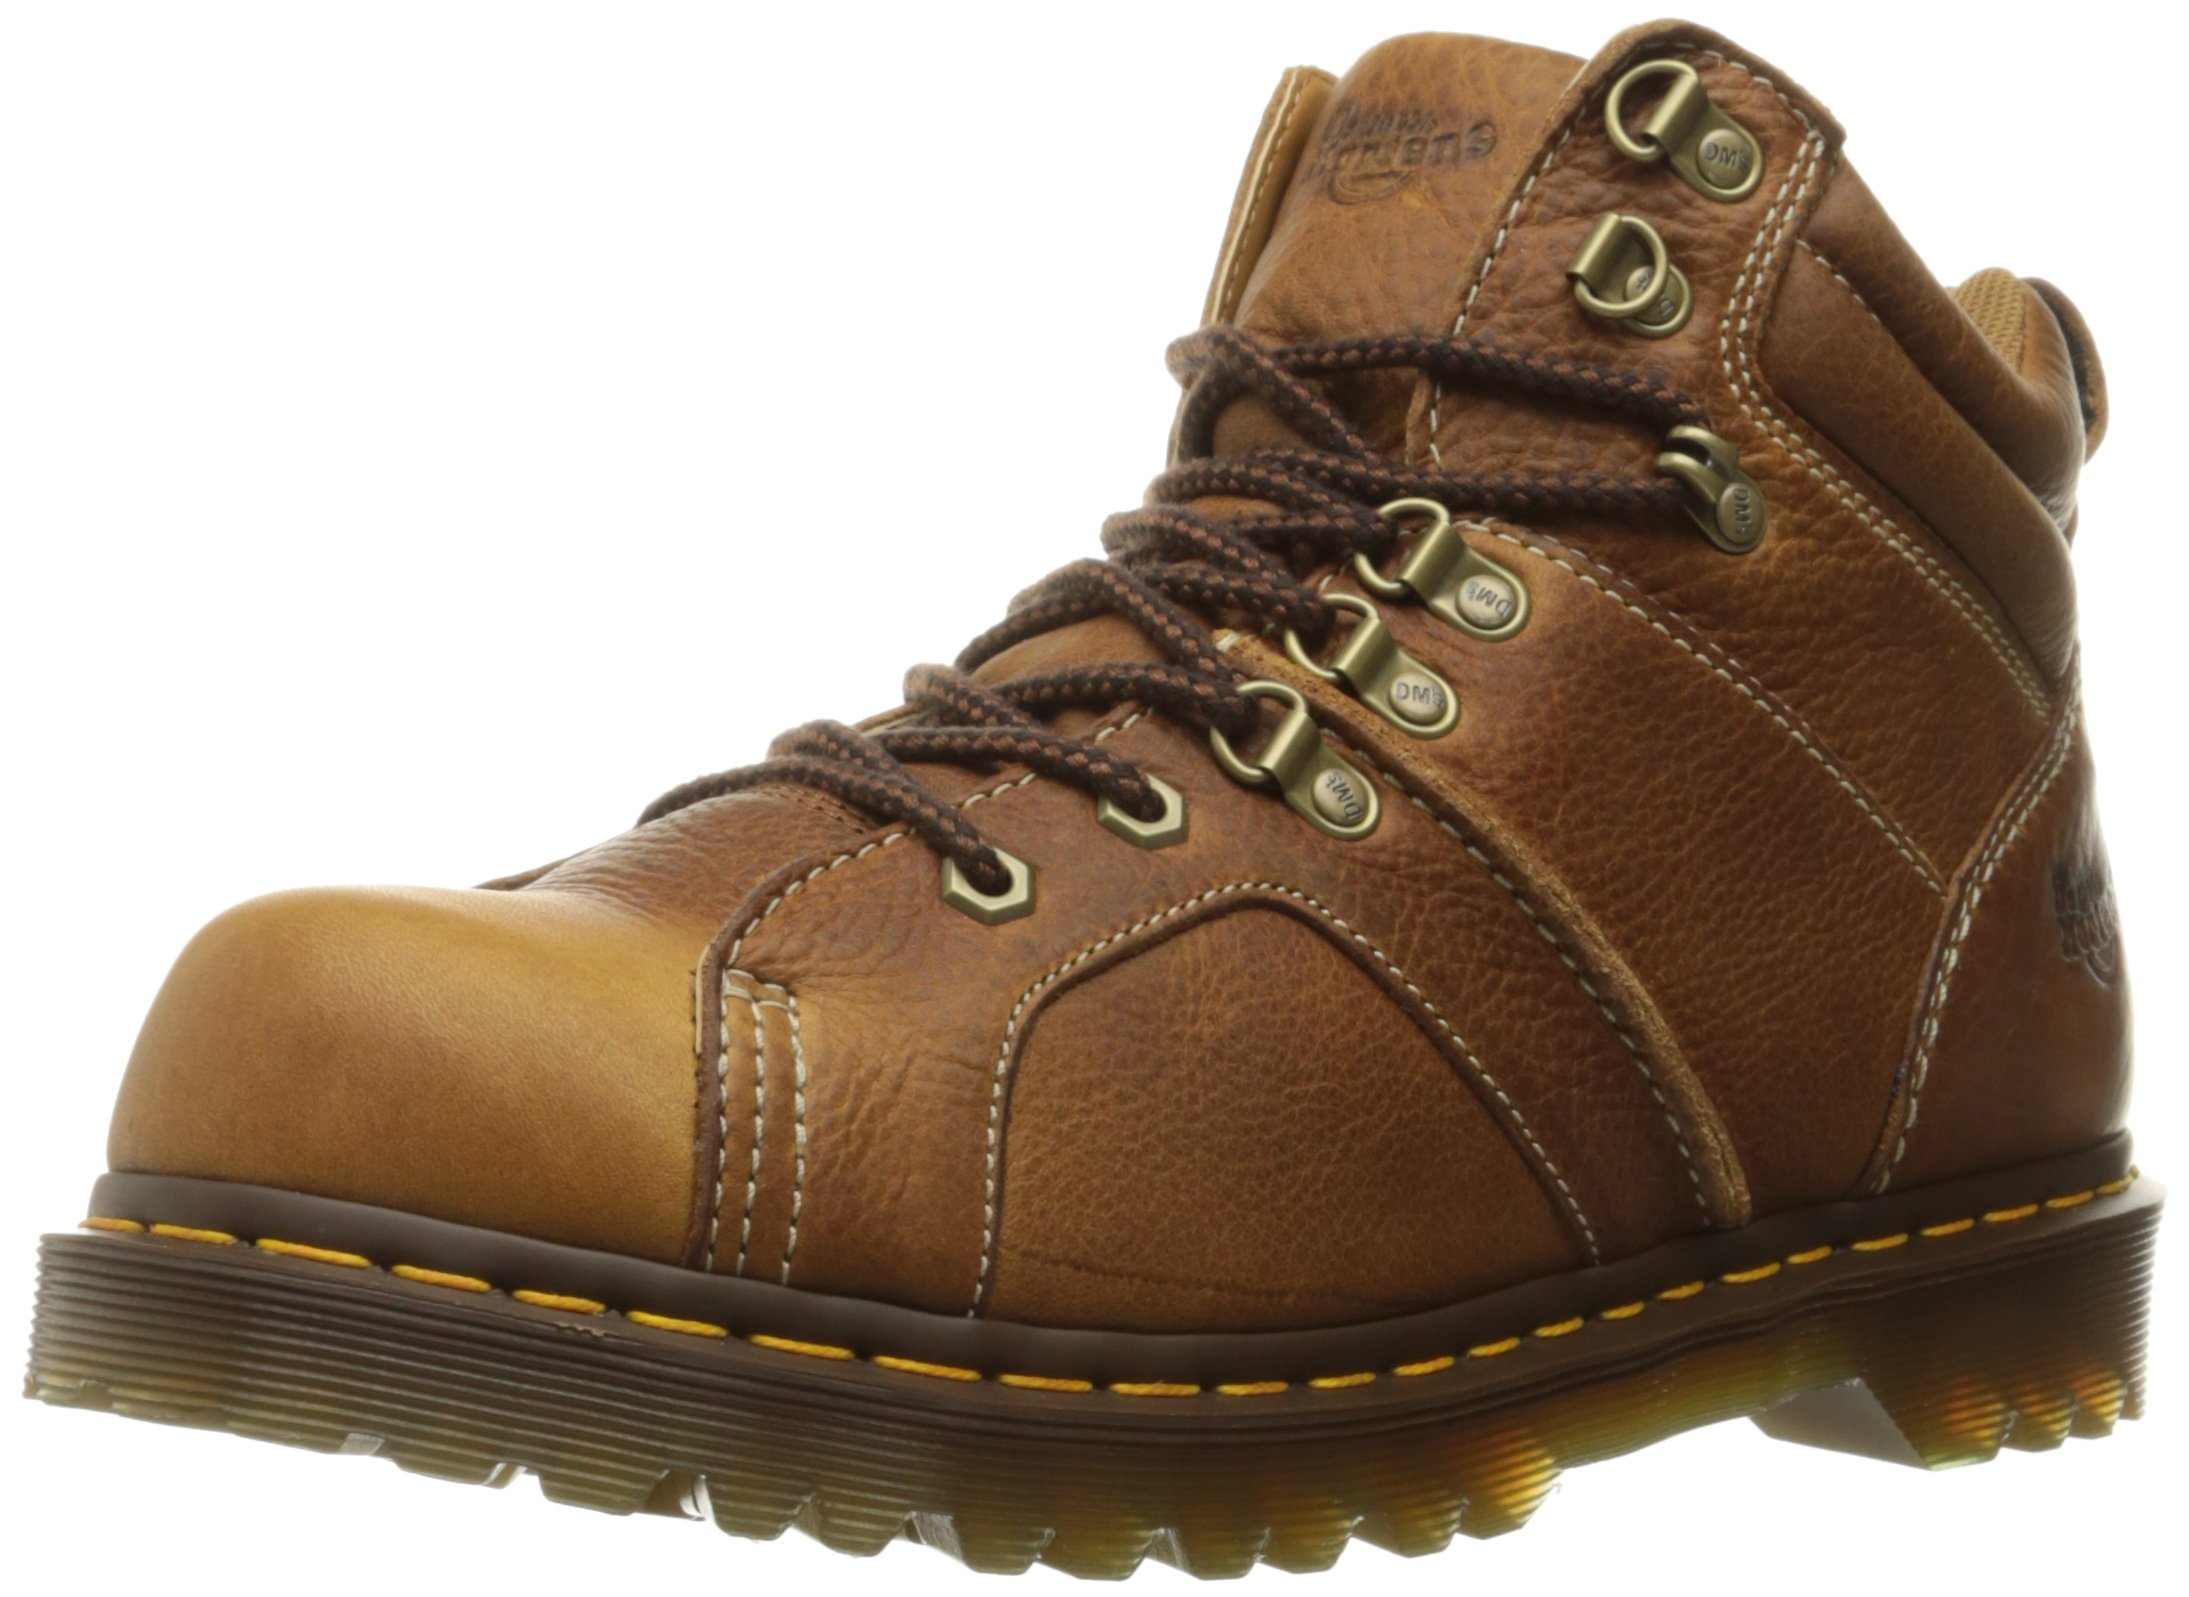 Dr. Martens Men's Fynn Western Boot, Tan, 11 UK/12 M US